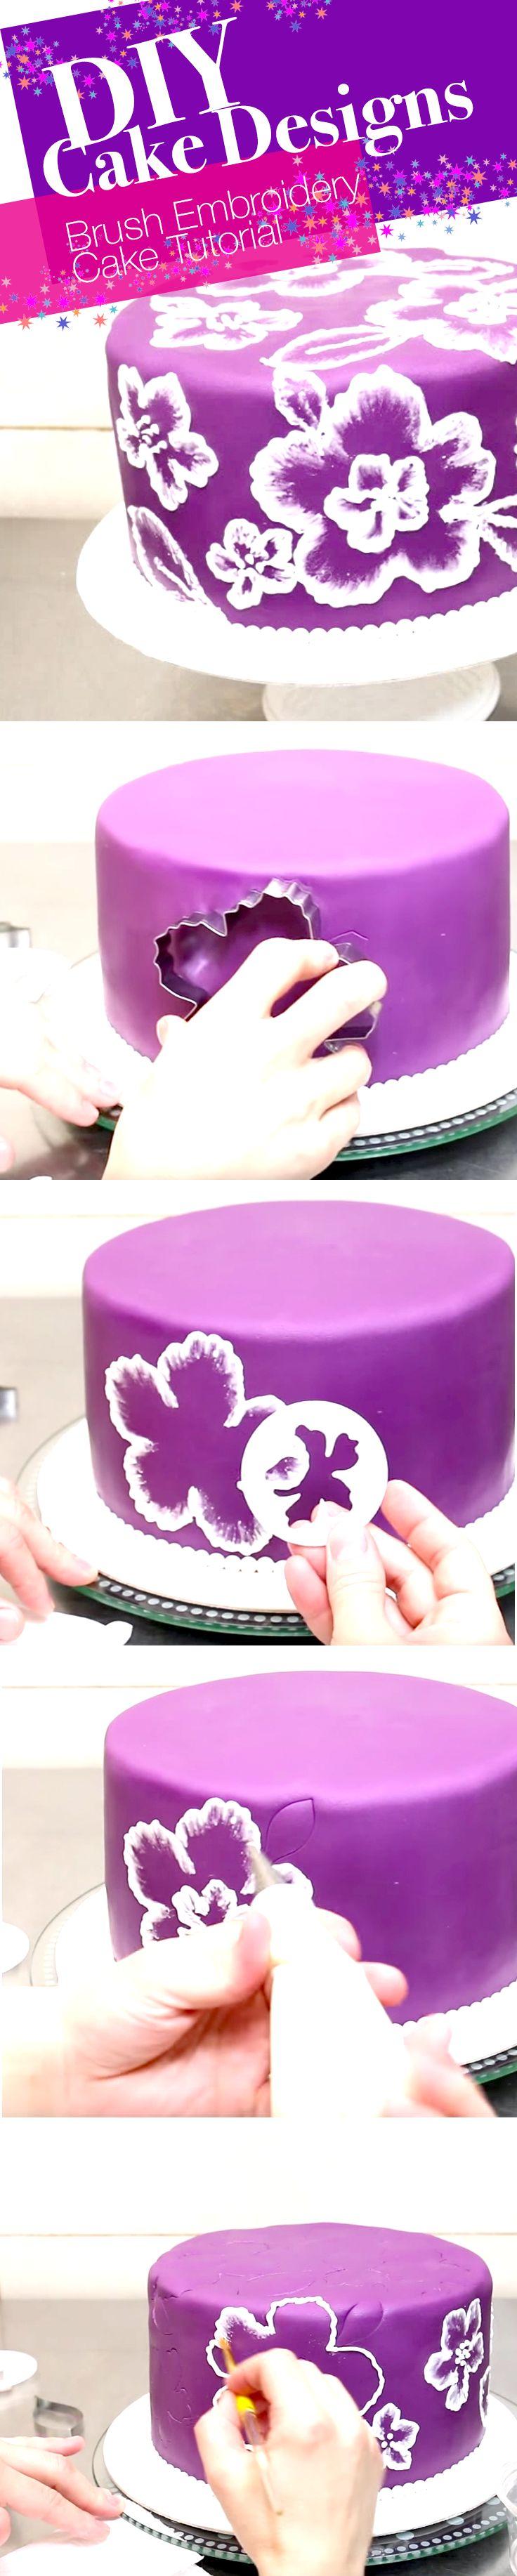 DIY Cake Designs: Brush Embroidery Cake Tutorial #cakedecoratingtutorials